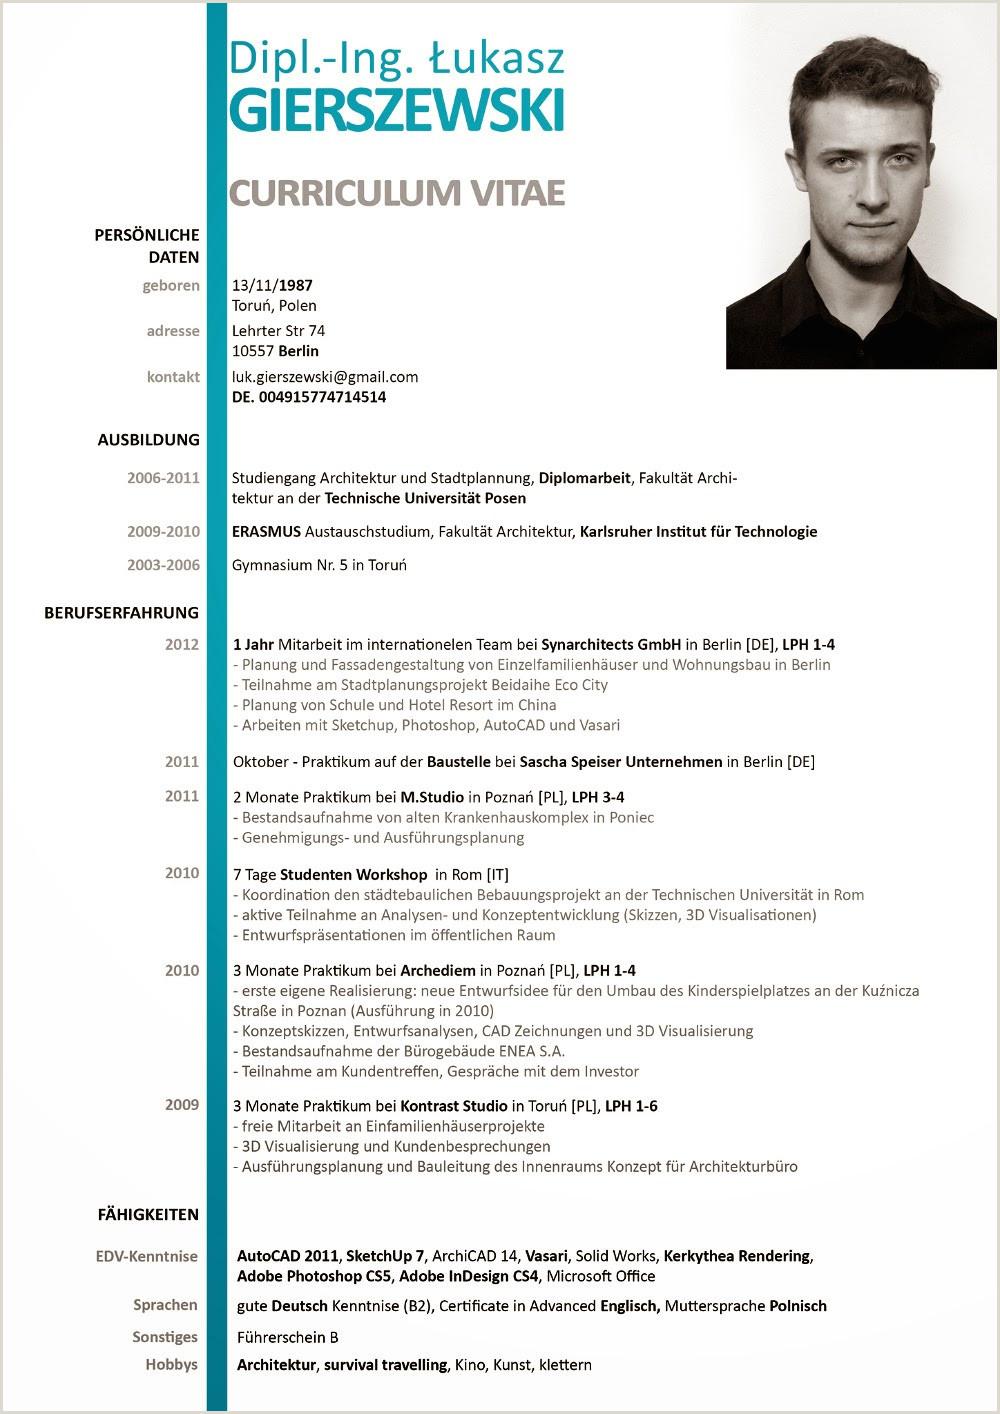 Curriculum Vitae Europeo Para Rellenar E Imprimir Imprimir Curriculum Vitae Baratos Fotocopias Baratas